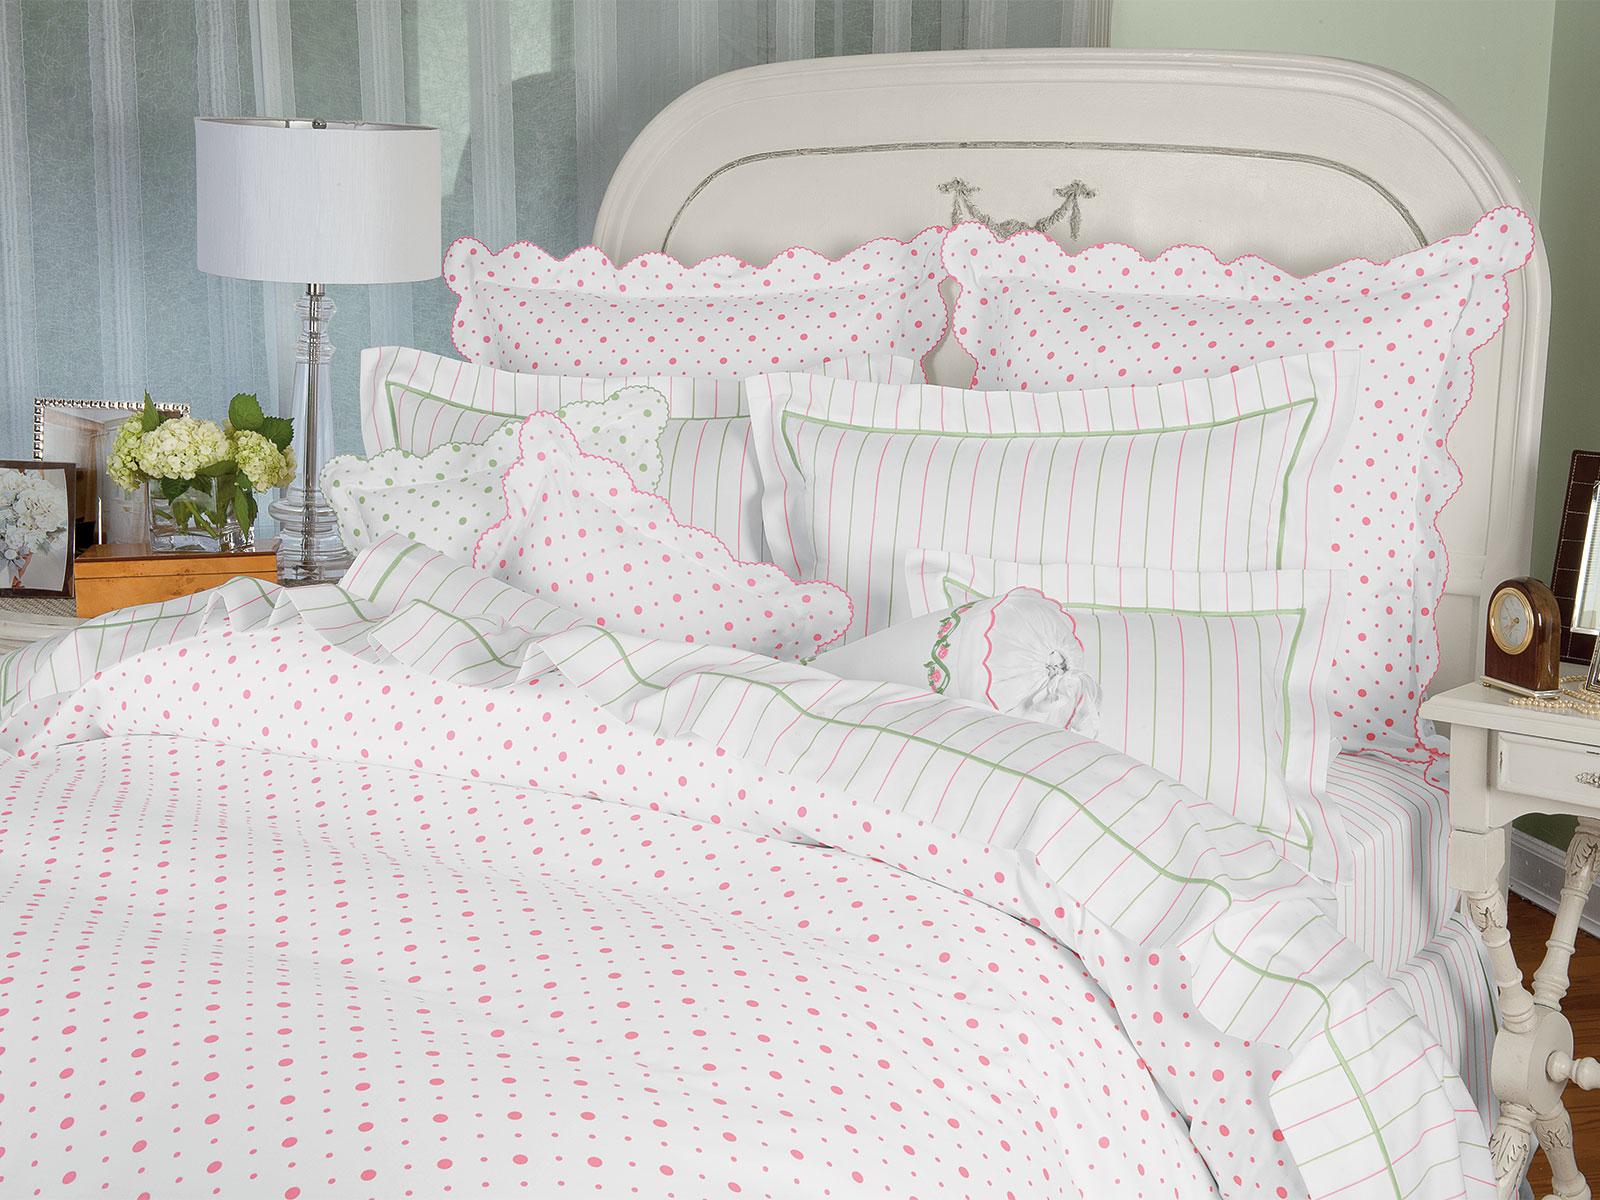 Petit Pois Bedding